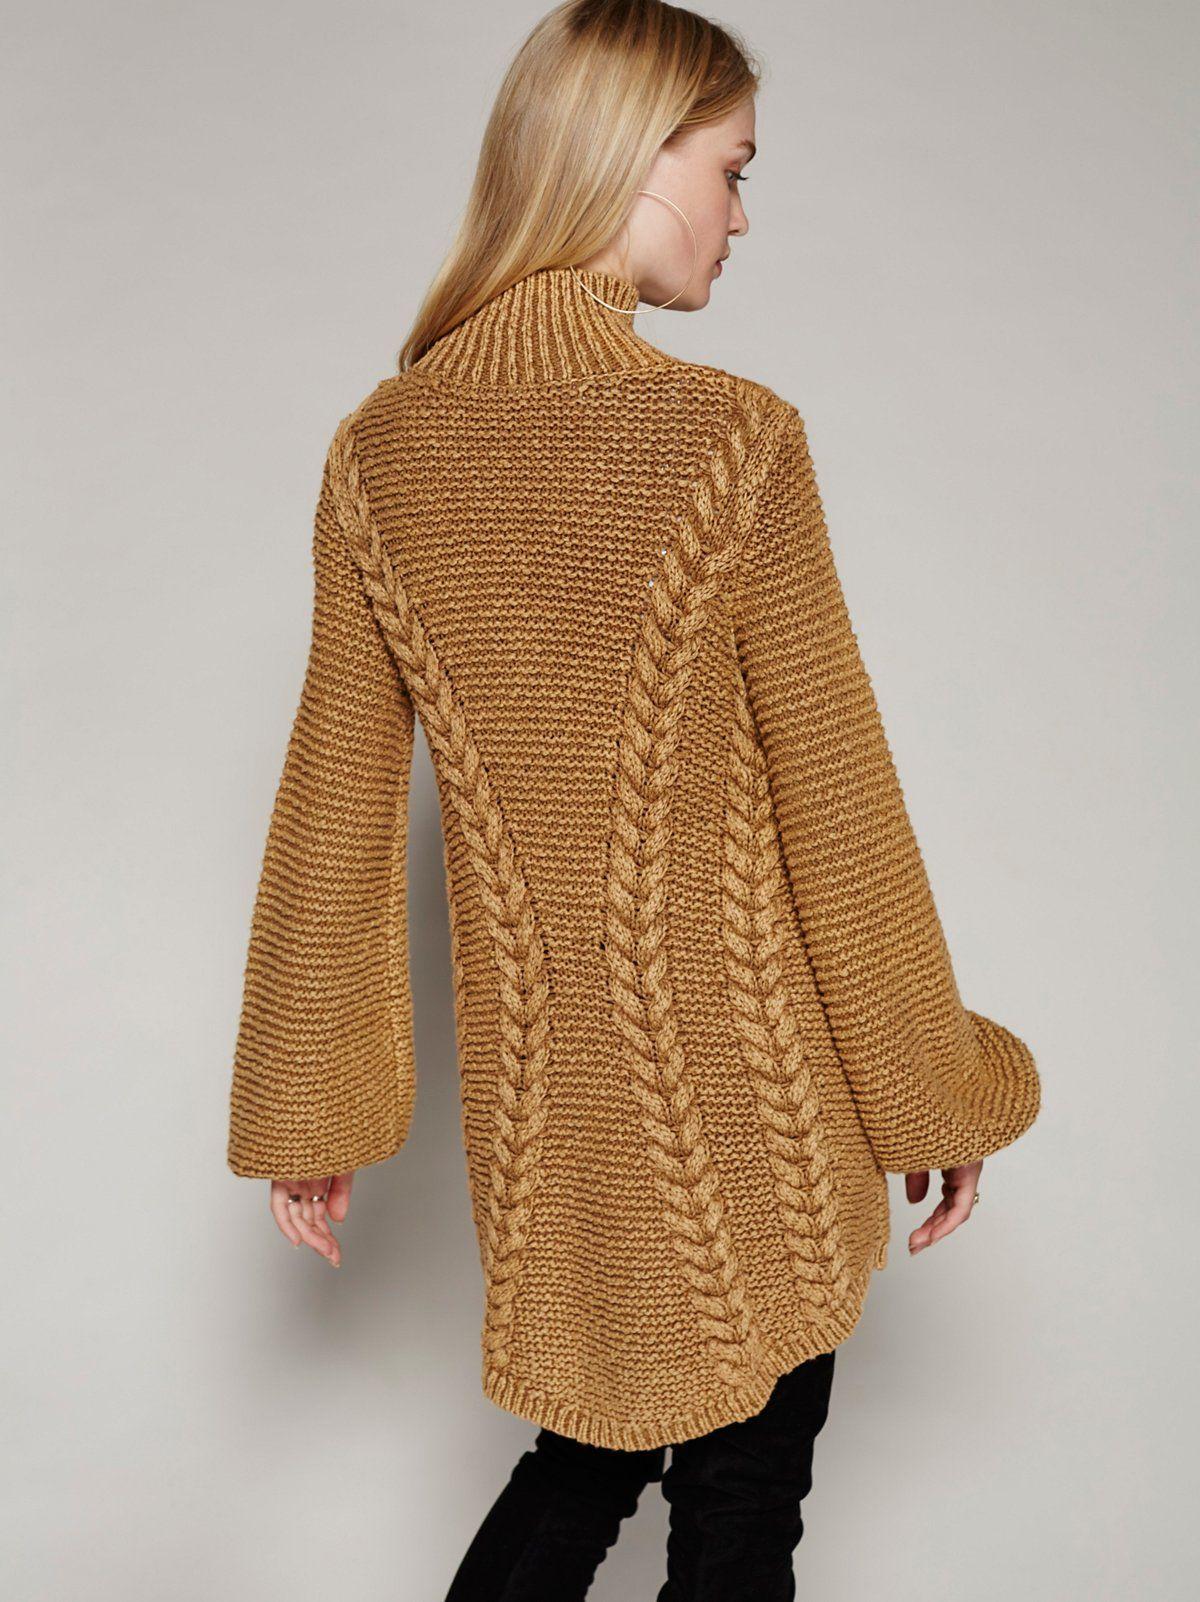 Free People Back To Back Sweater Mini | Minis